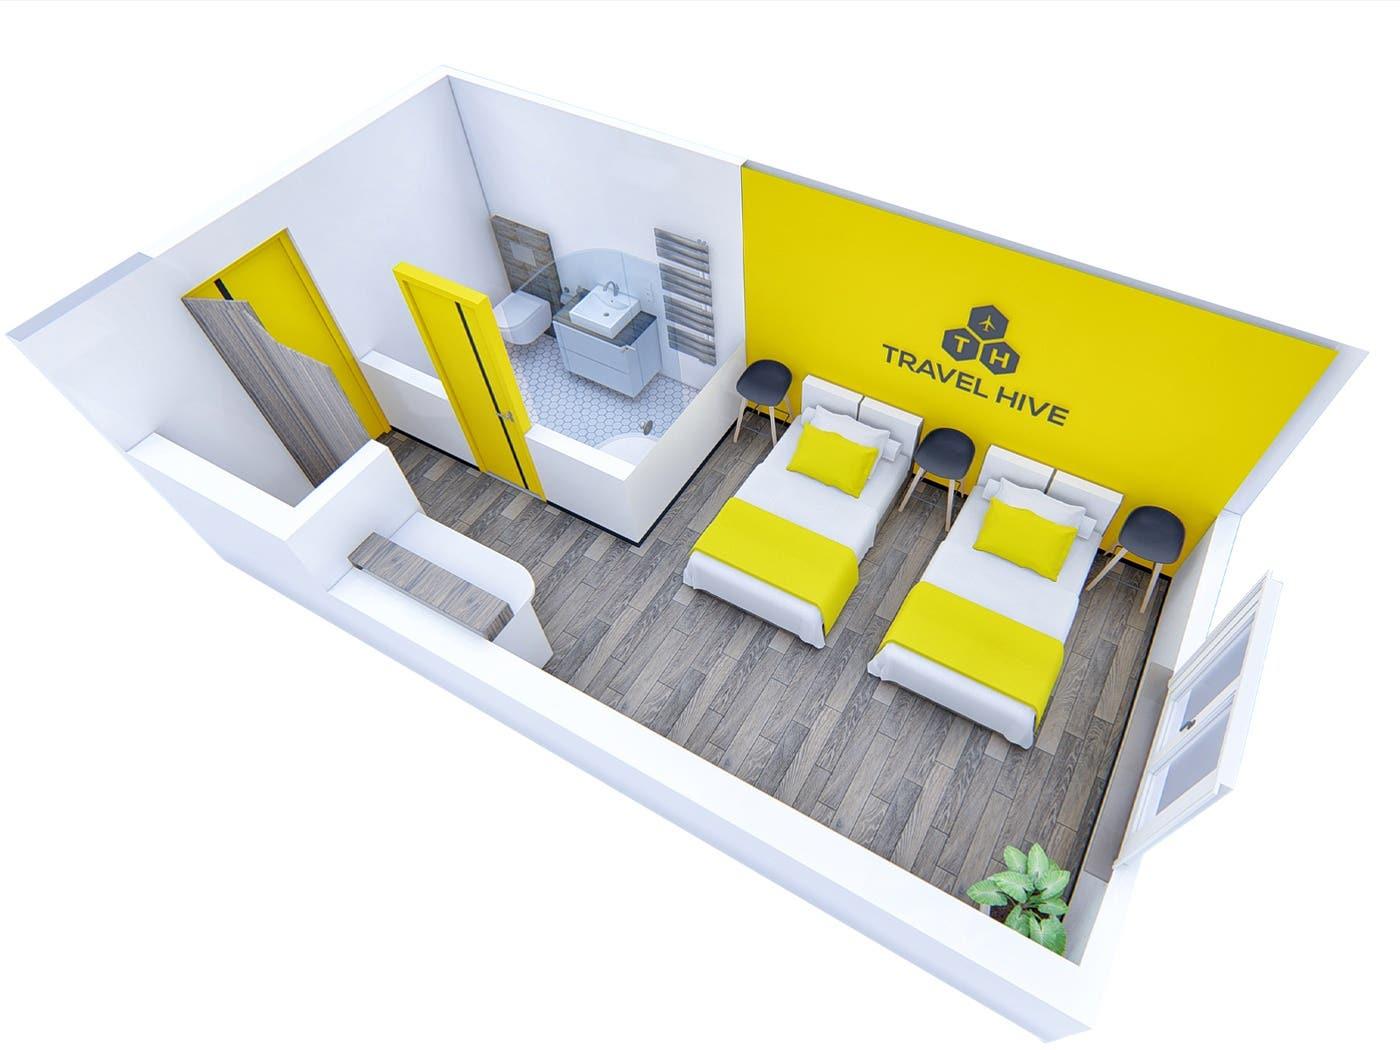 1555195-hotel-yellow-1600x1200.jpg